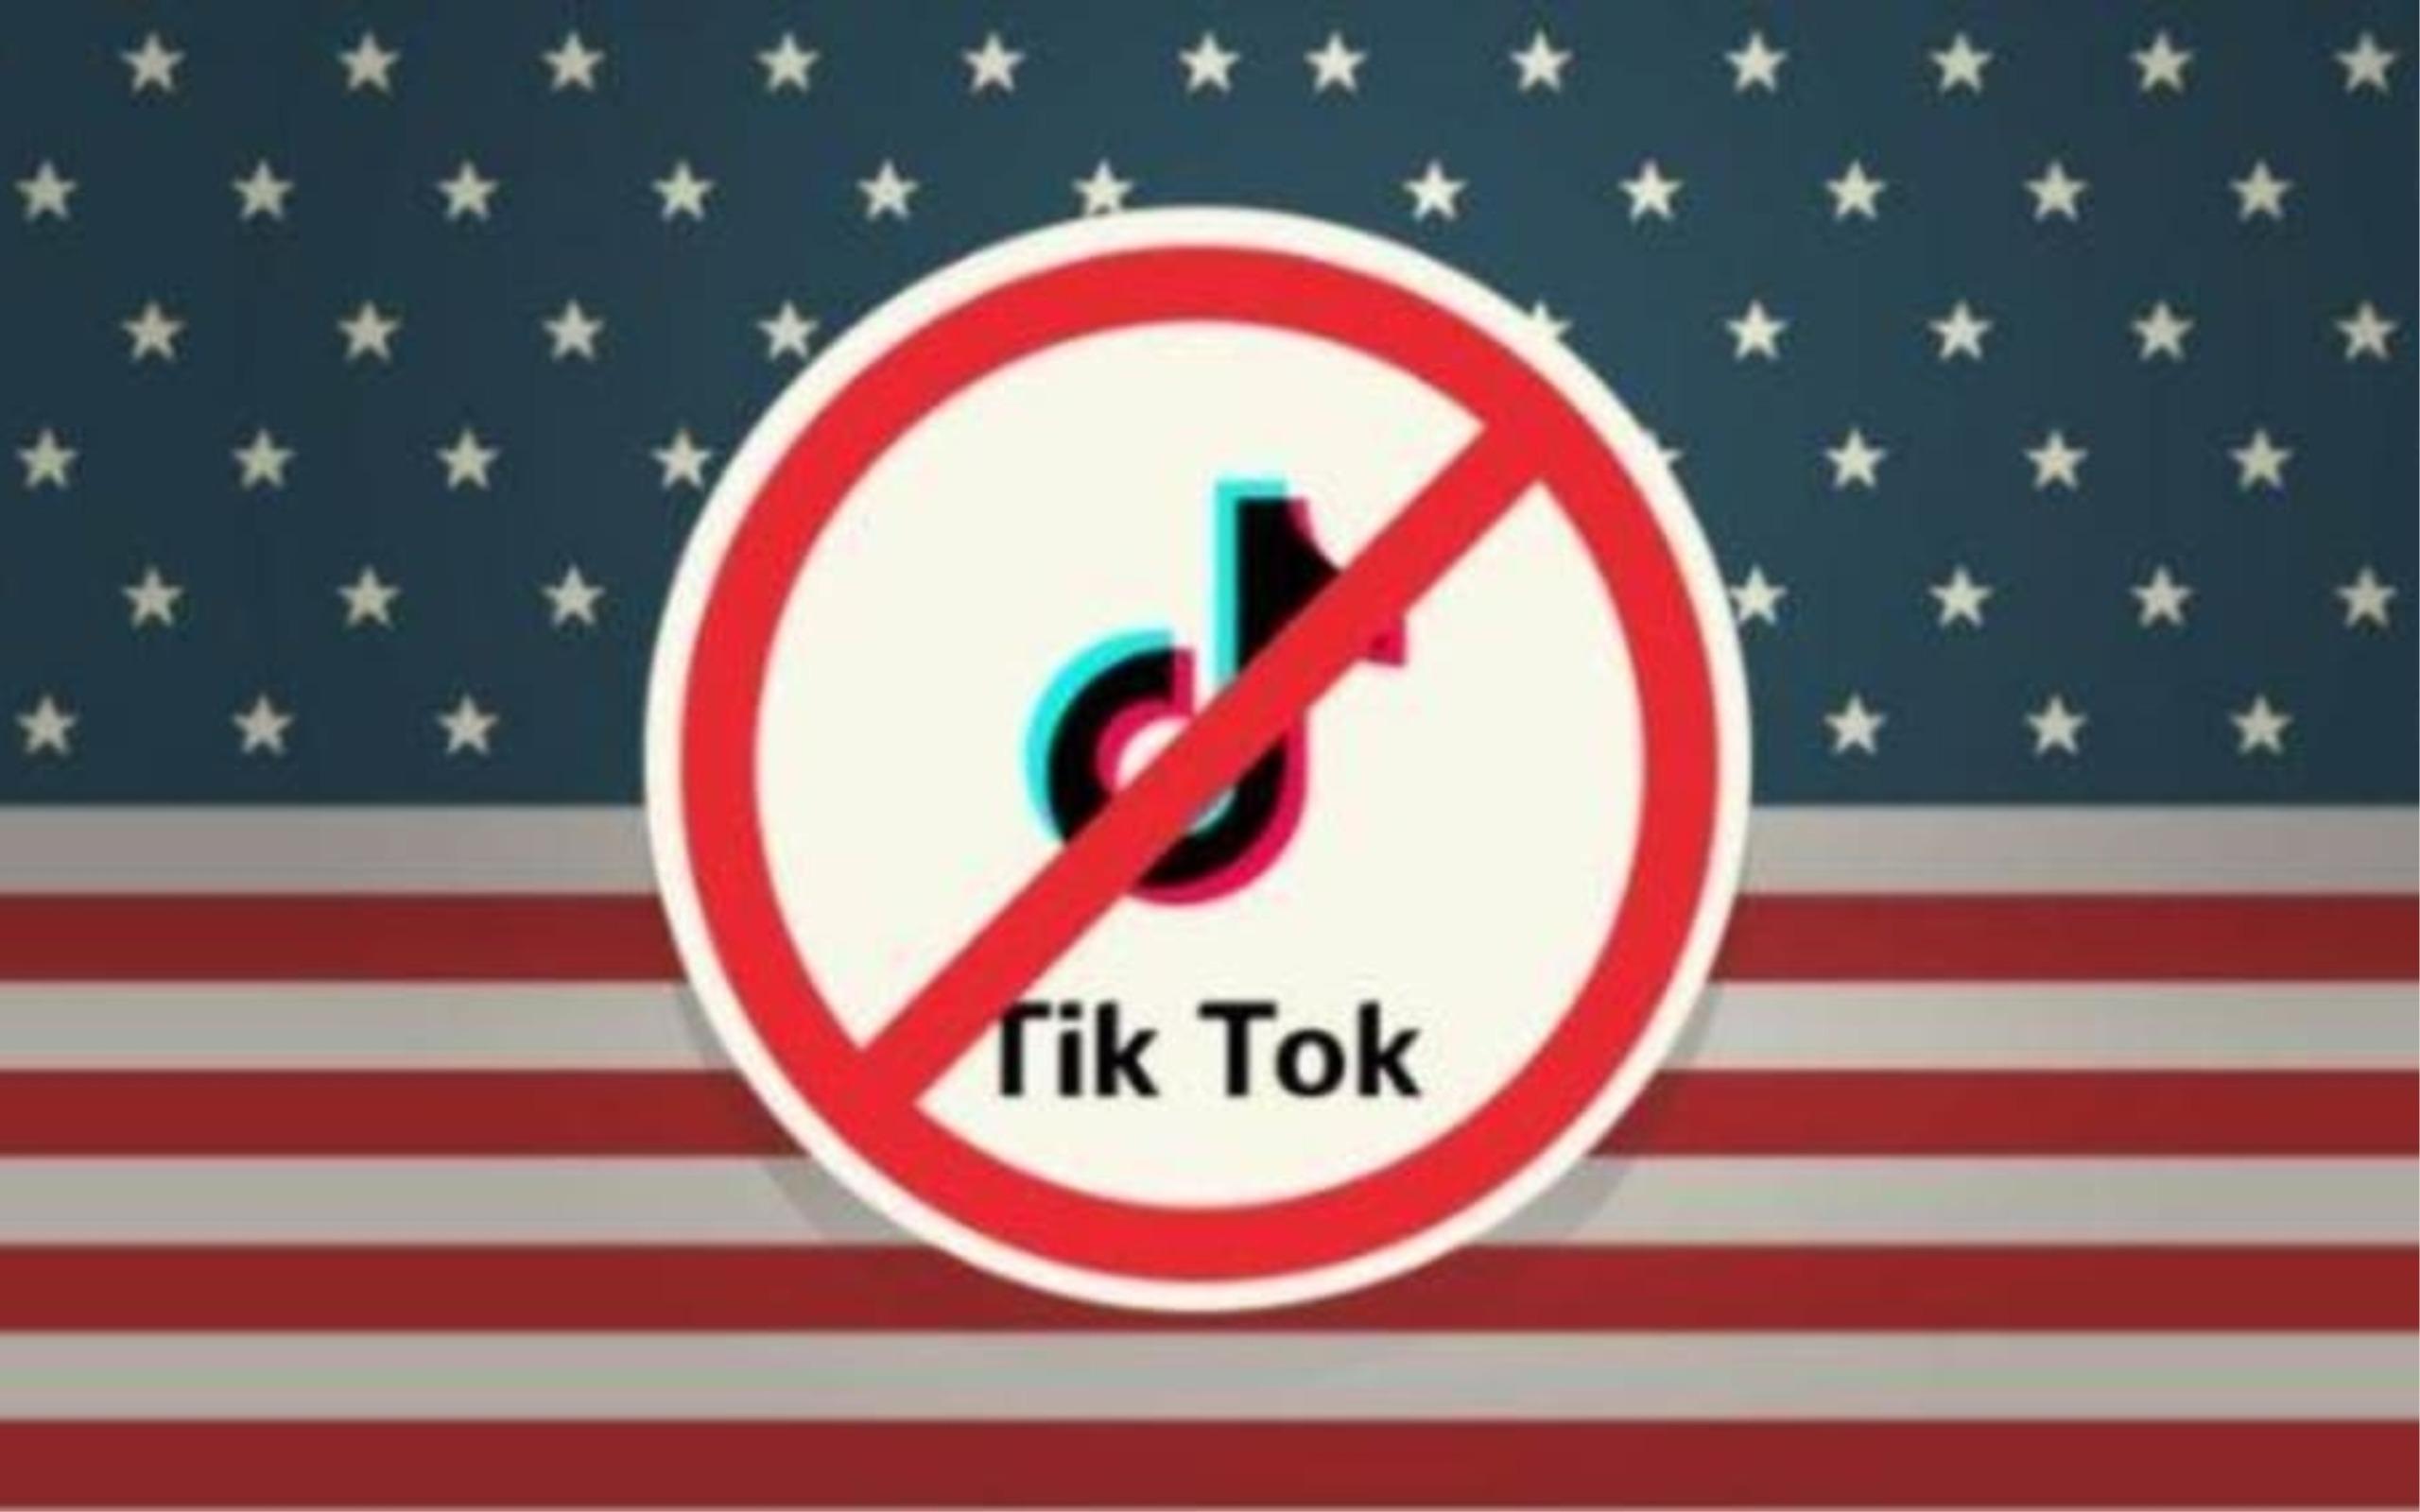 China Asks US To 'Correct Mistake' After Trump Bans TikTok